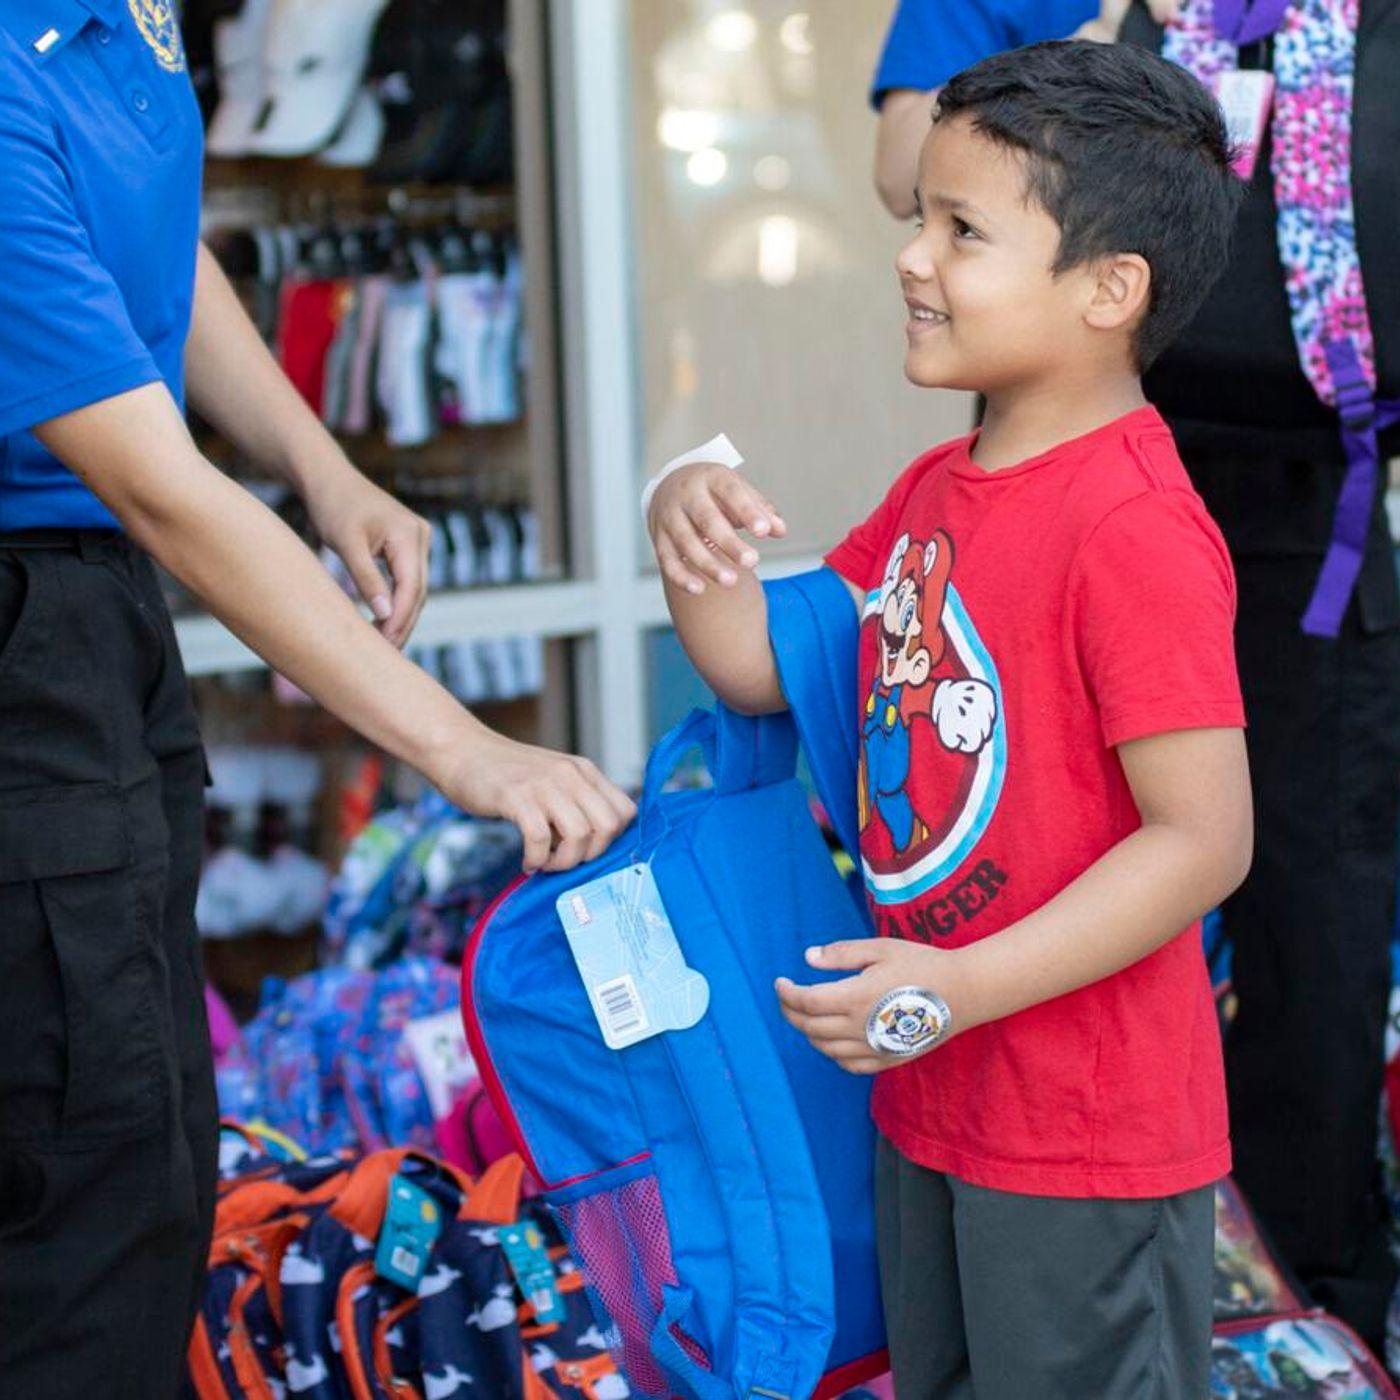 Cops & Kids Hang Out